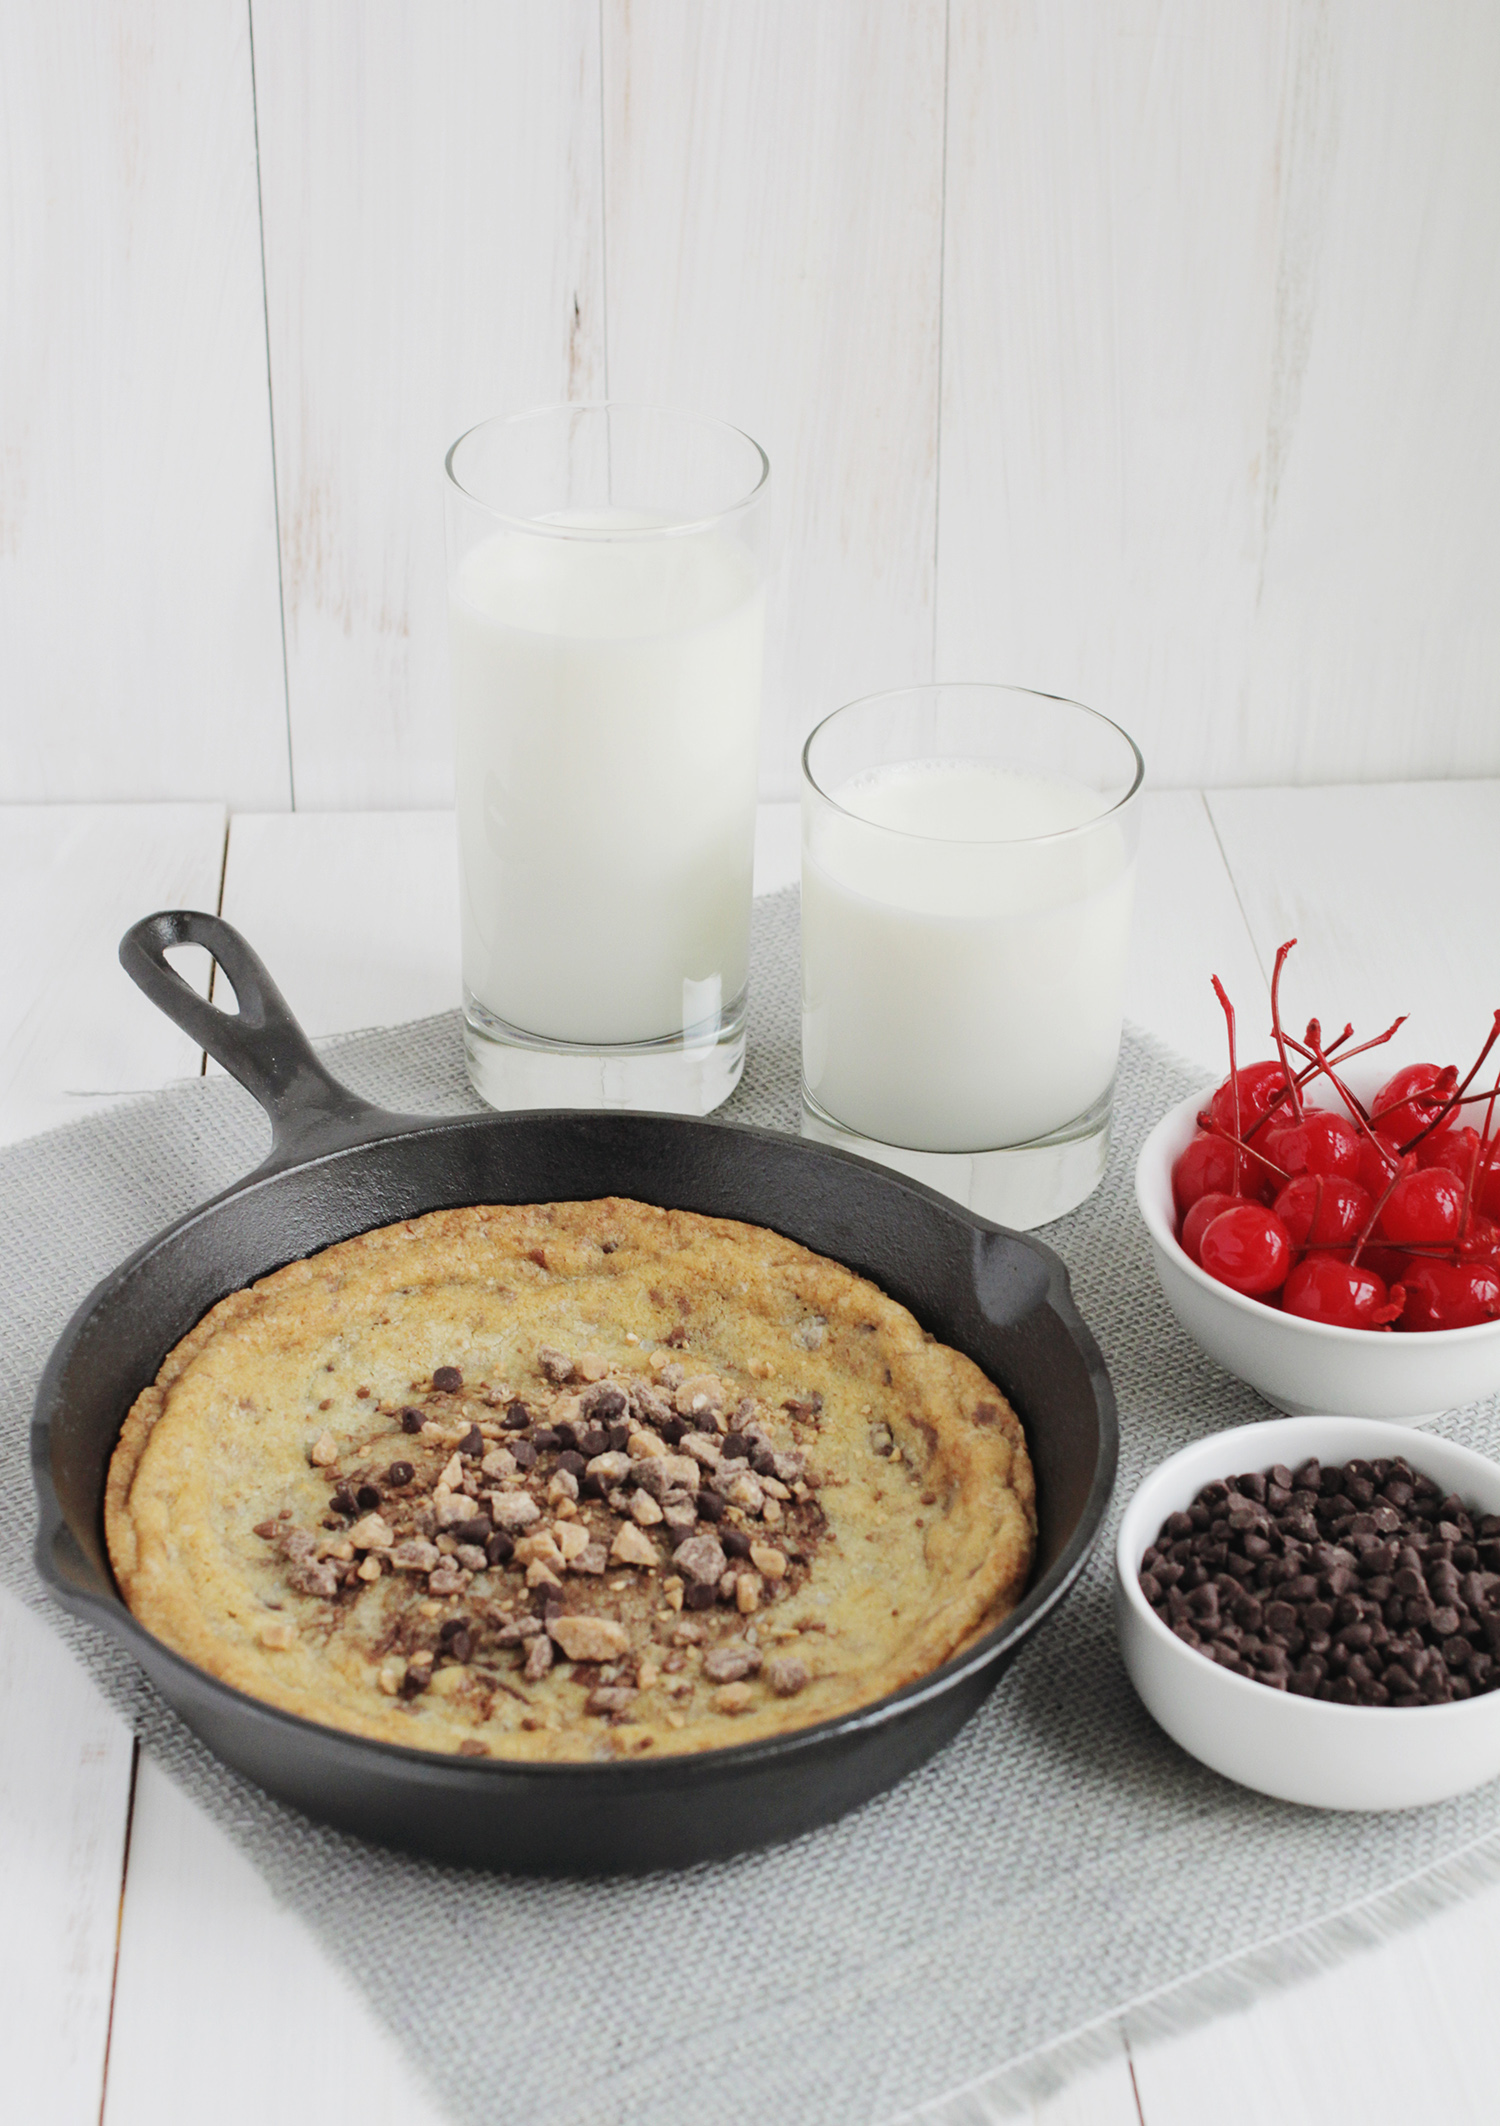 Homemade skillet cookie (click through for recipe)